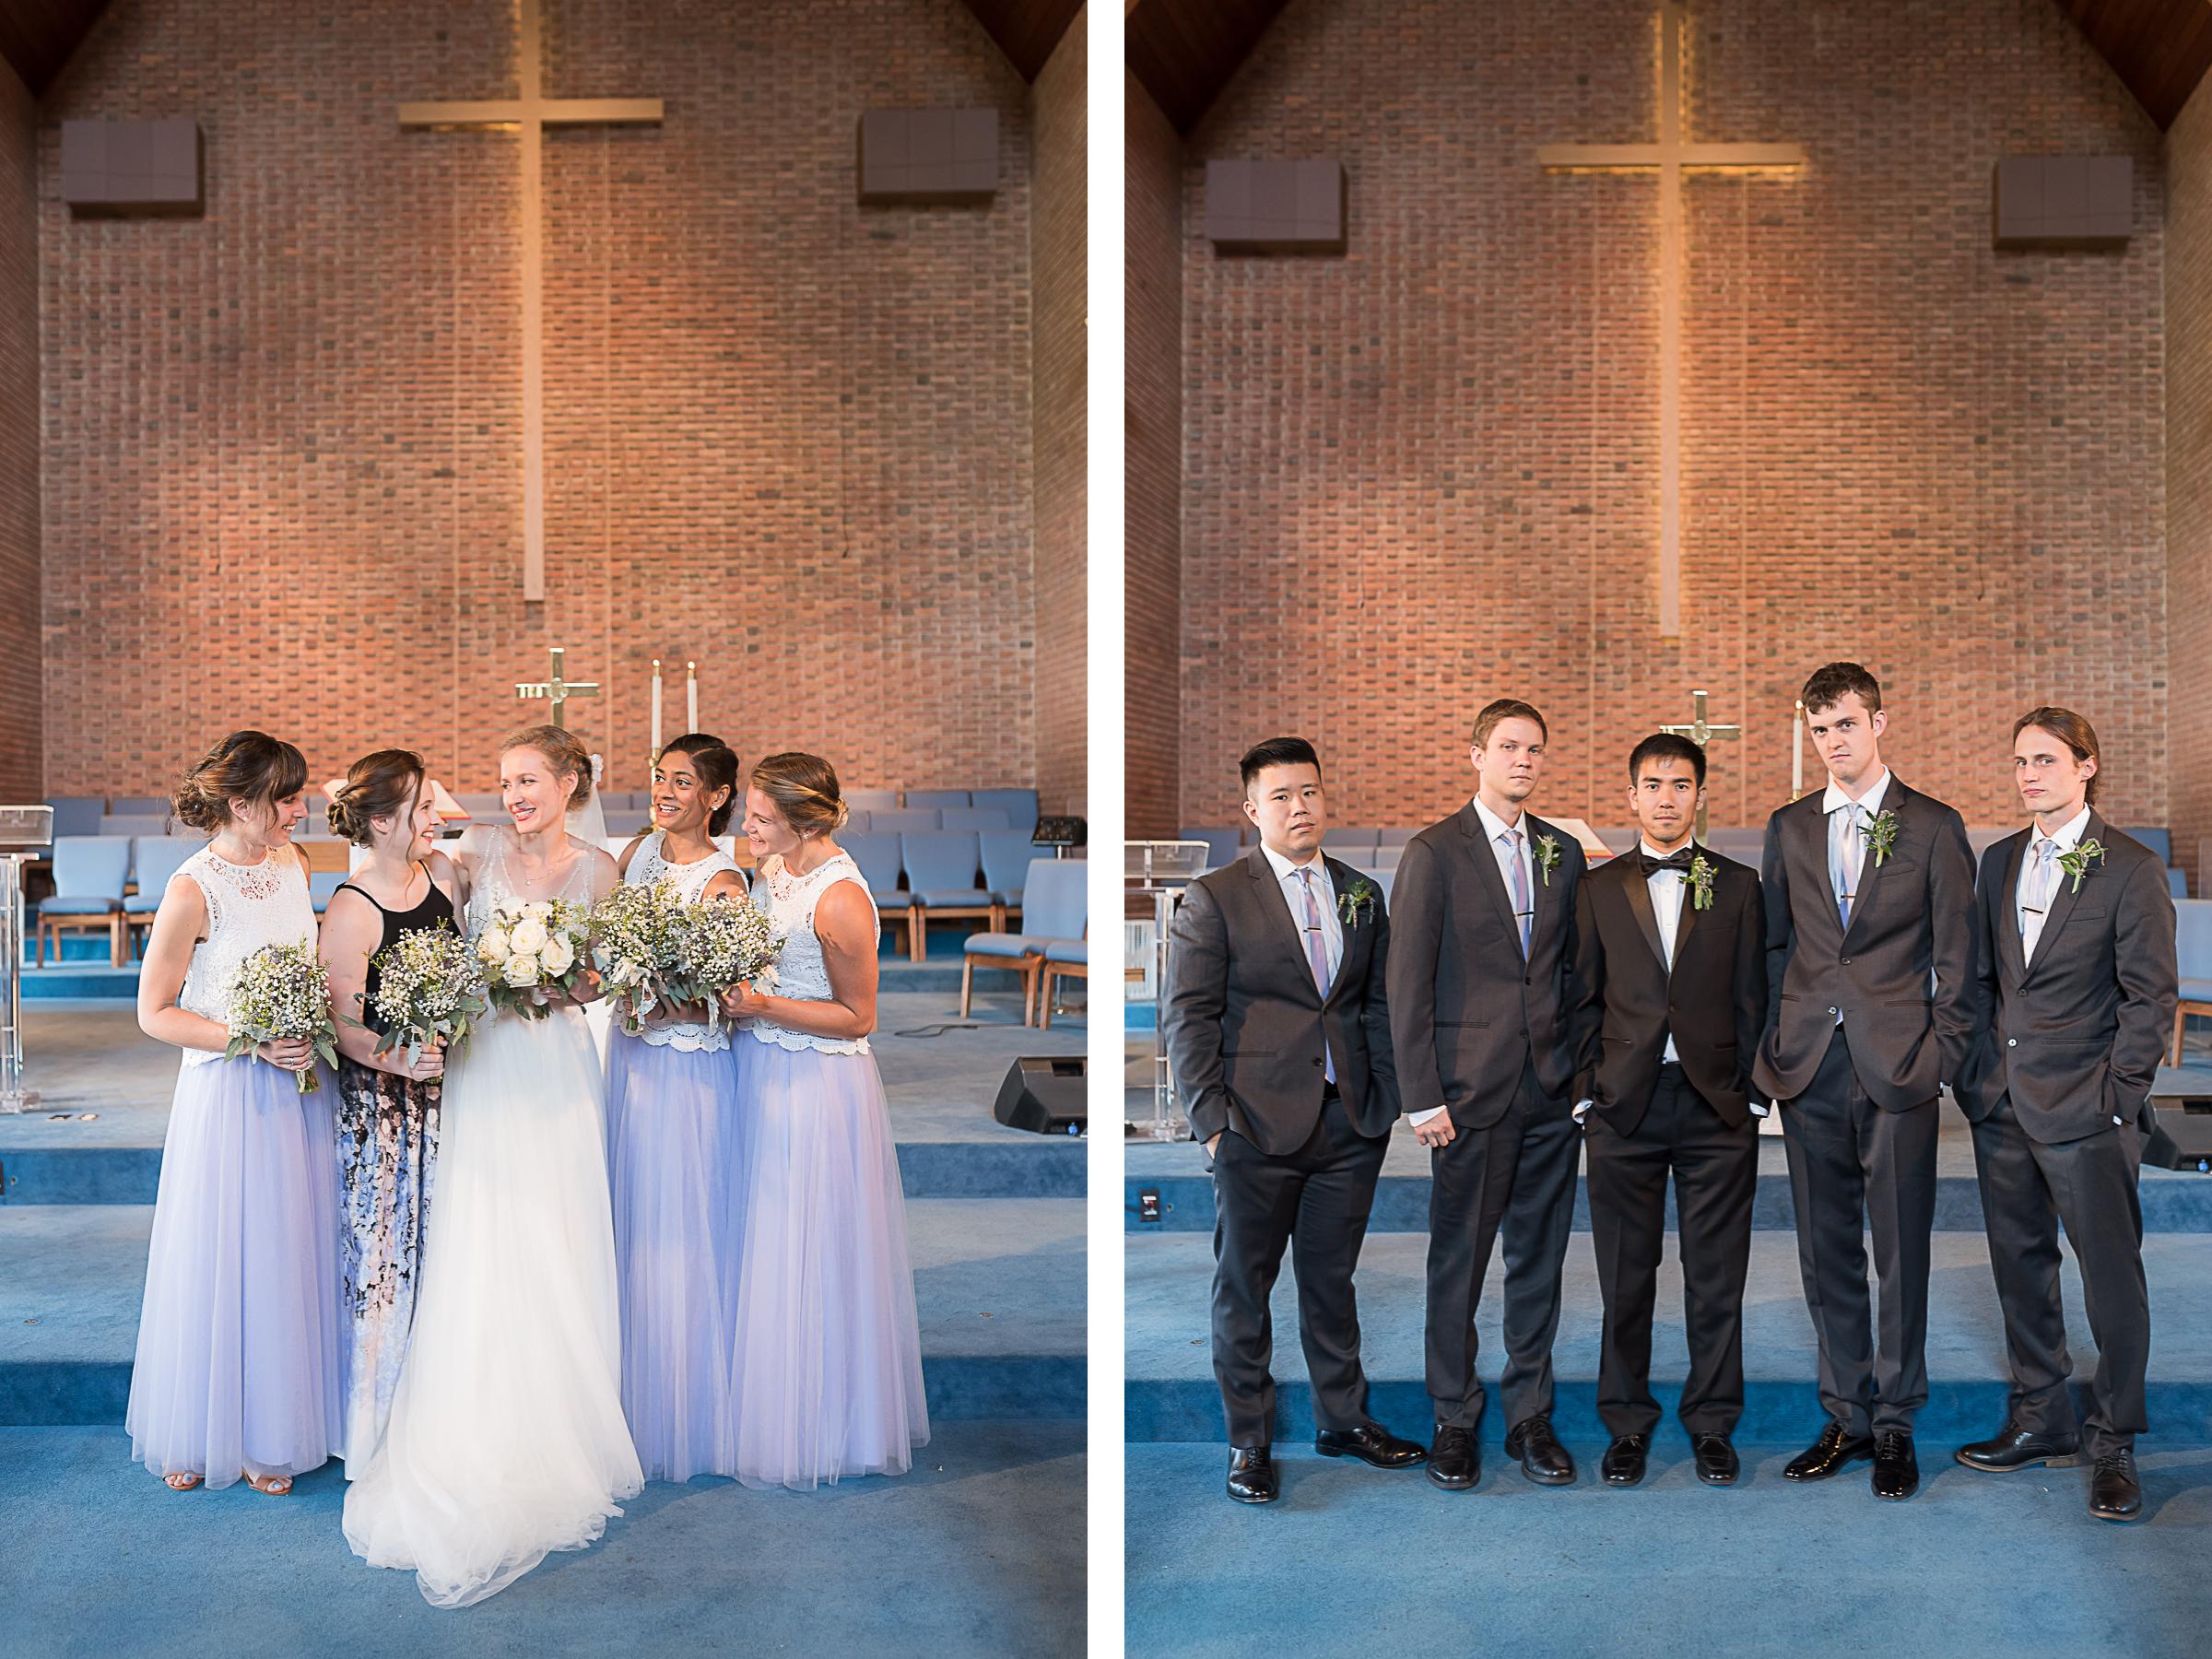 Elkridge-Furnace-Inn-Wedding-Ceremony-Bride-Bridesmaids